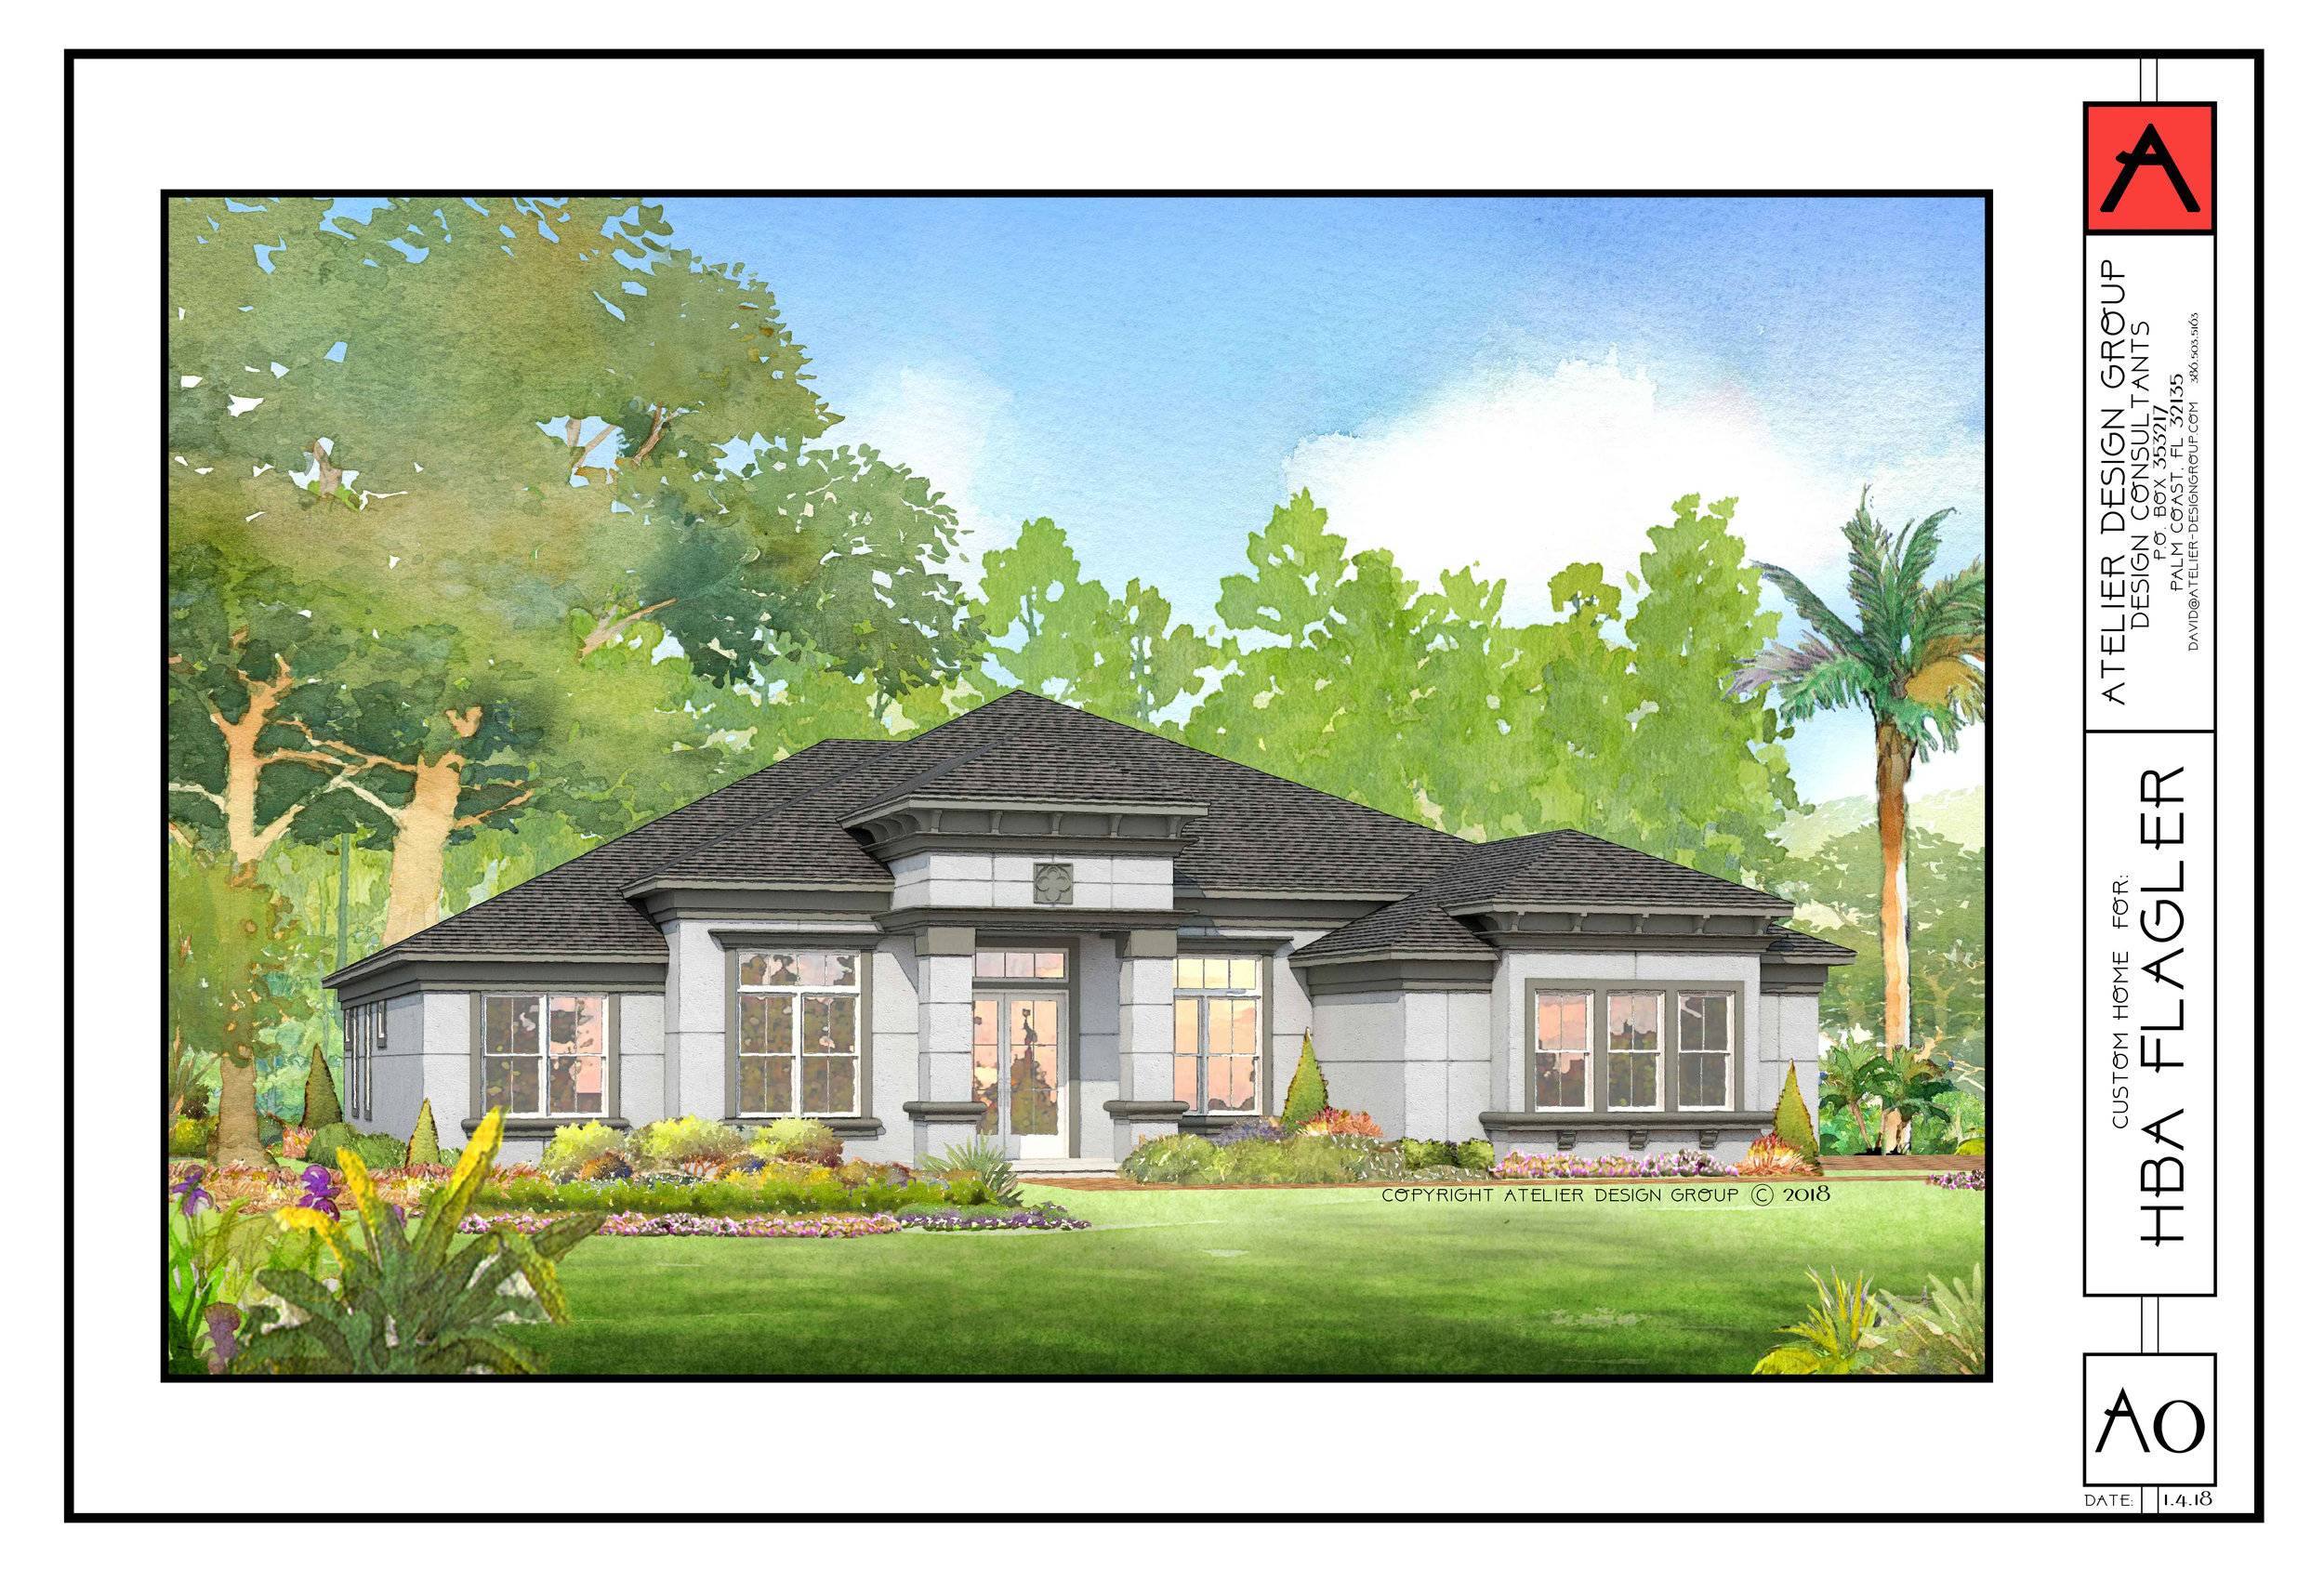 Rendering: The Paradise Home for the Flagler Home Builders Association.  http://www.flaglerhba.com/paradise